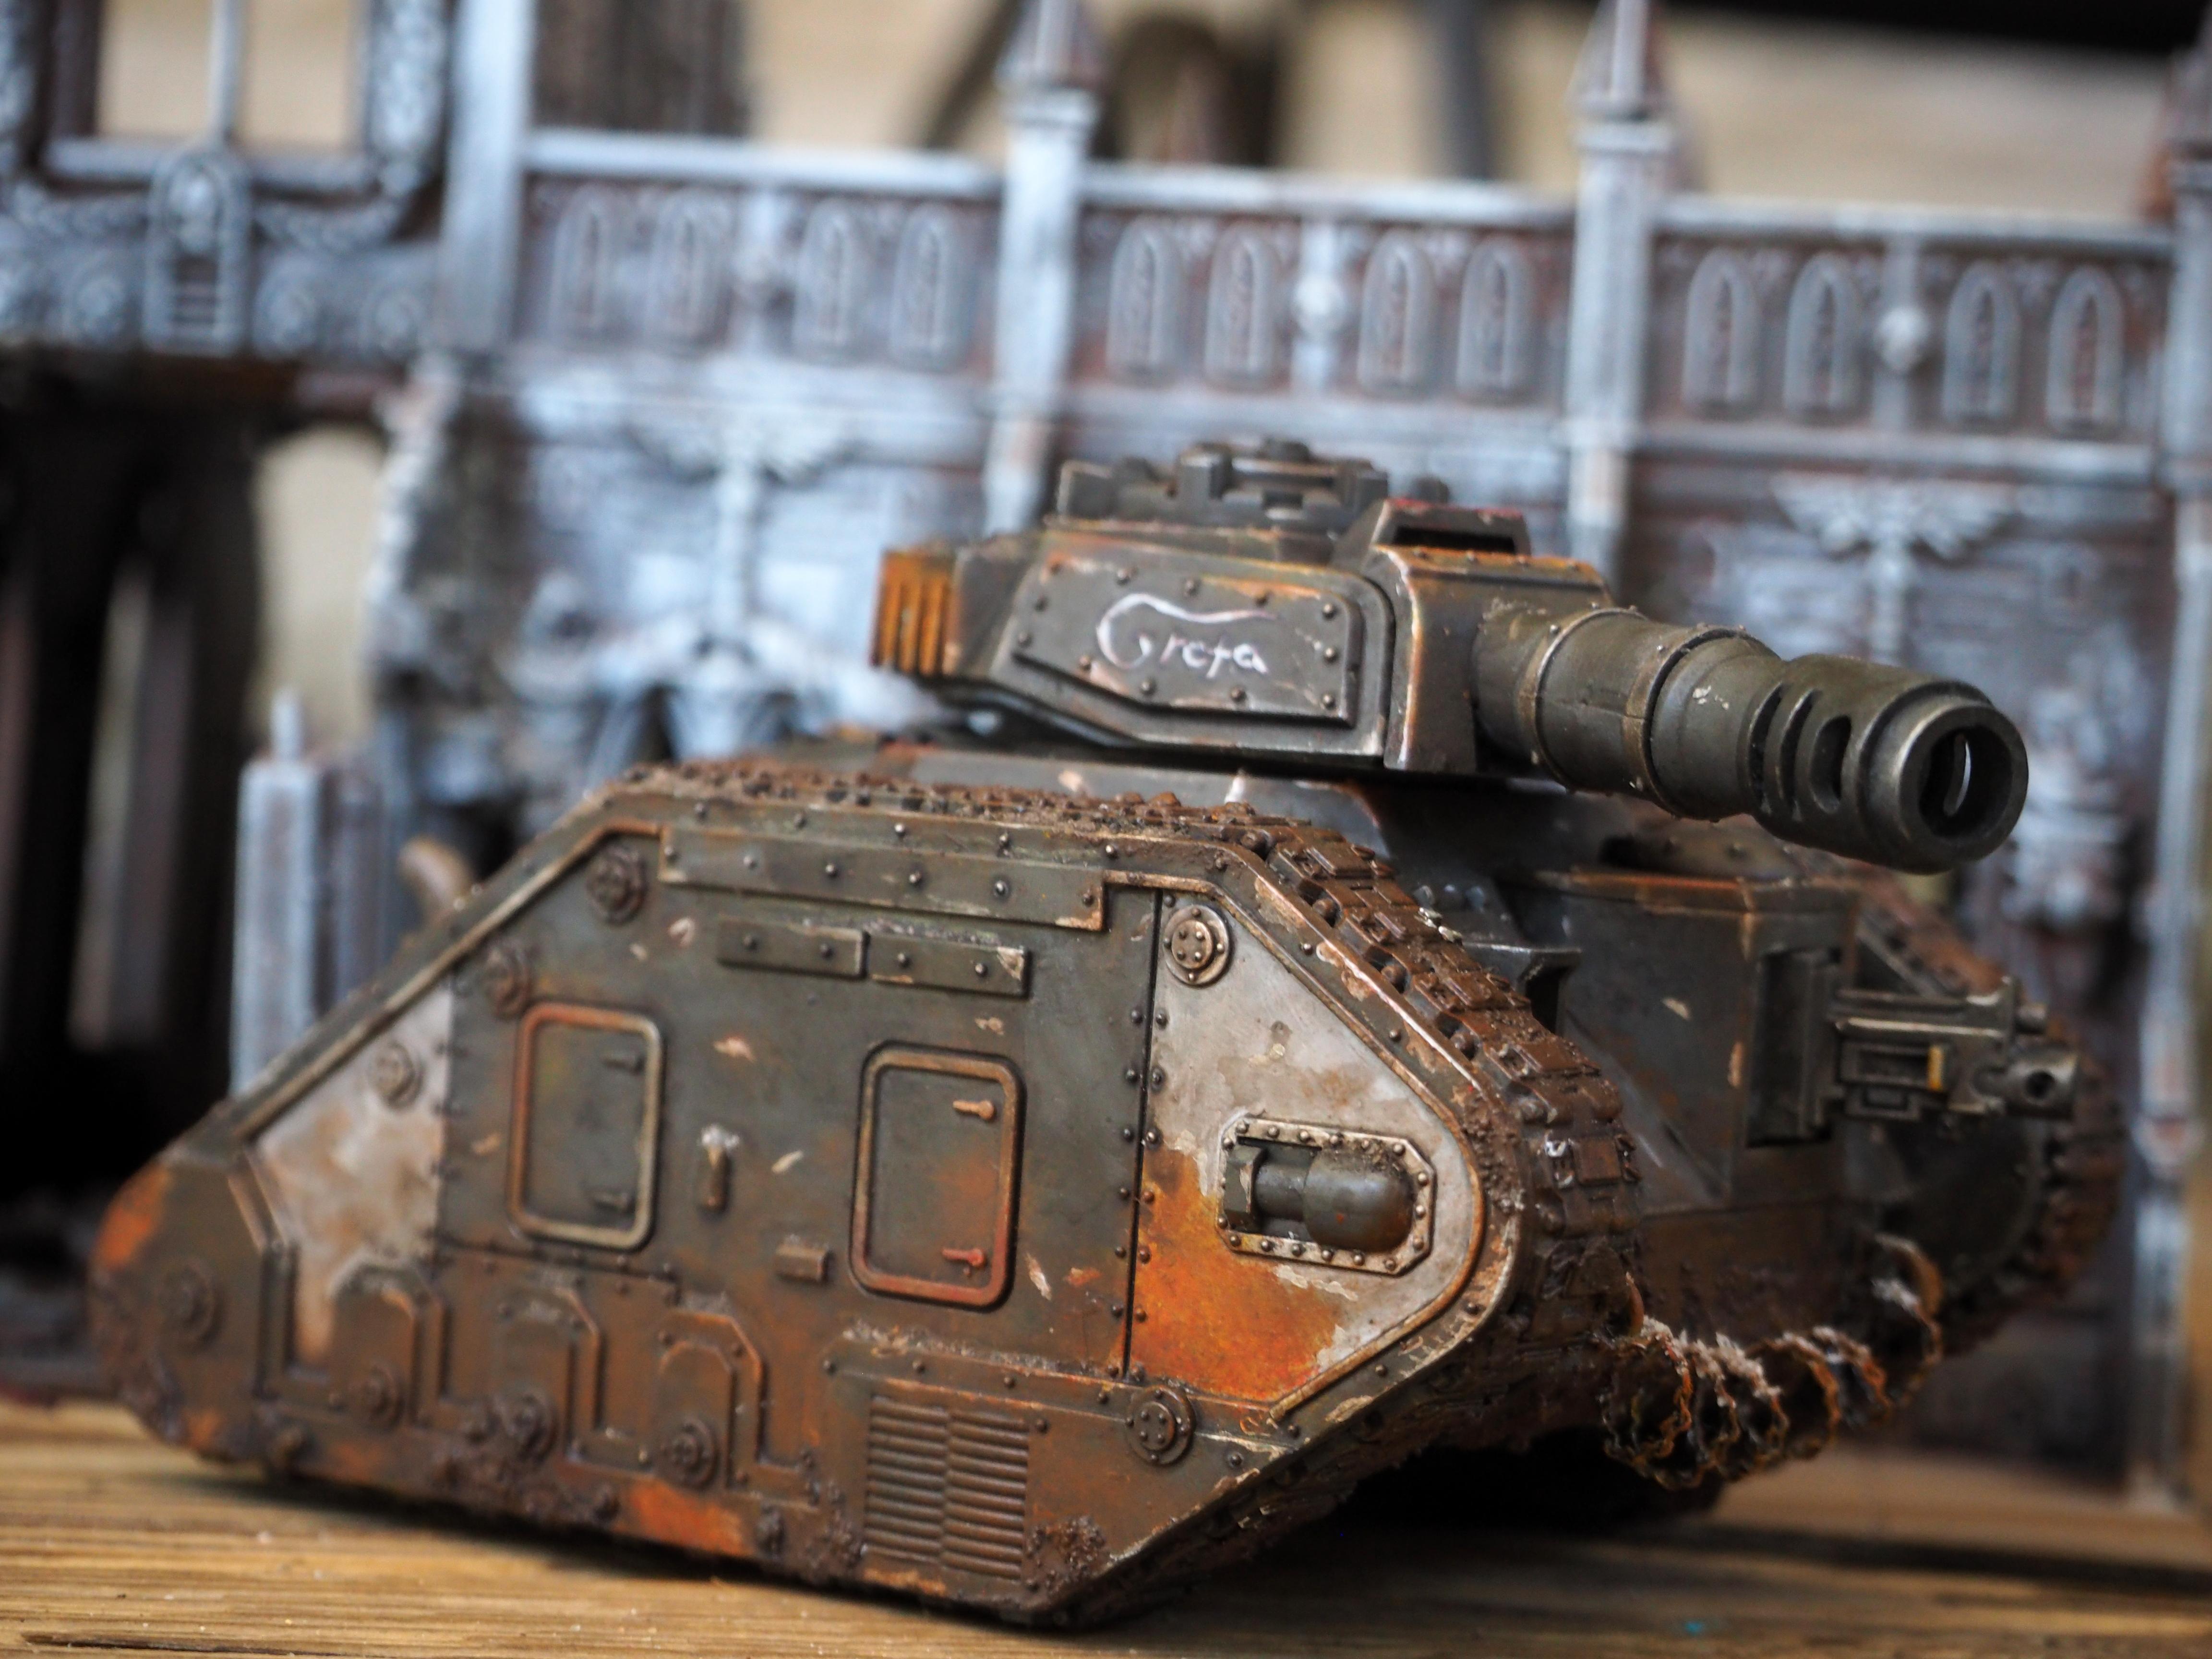 Astra Militarum, Death, Death Korps of Krieg, Imperial Guard, Korps, Leman, Russ, Rusty, Tank, Weathered